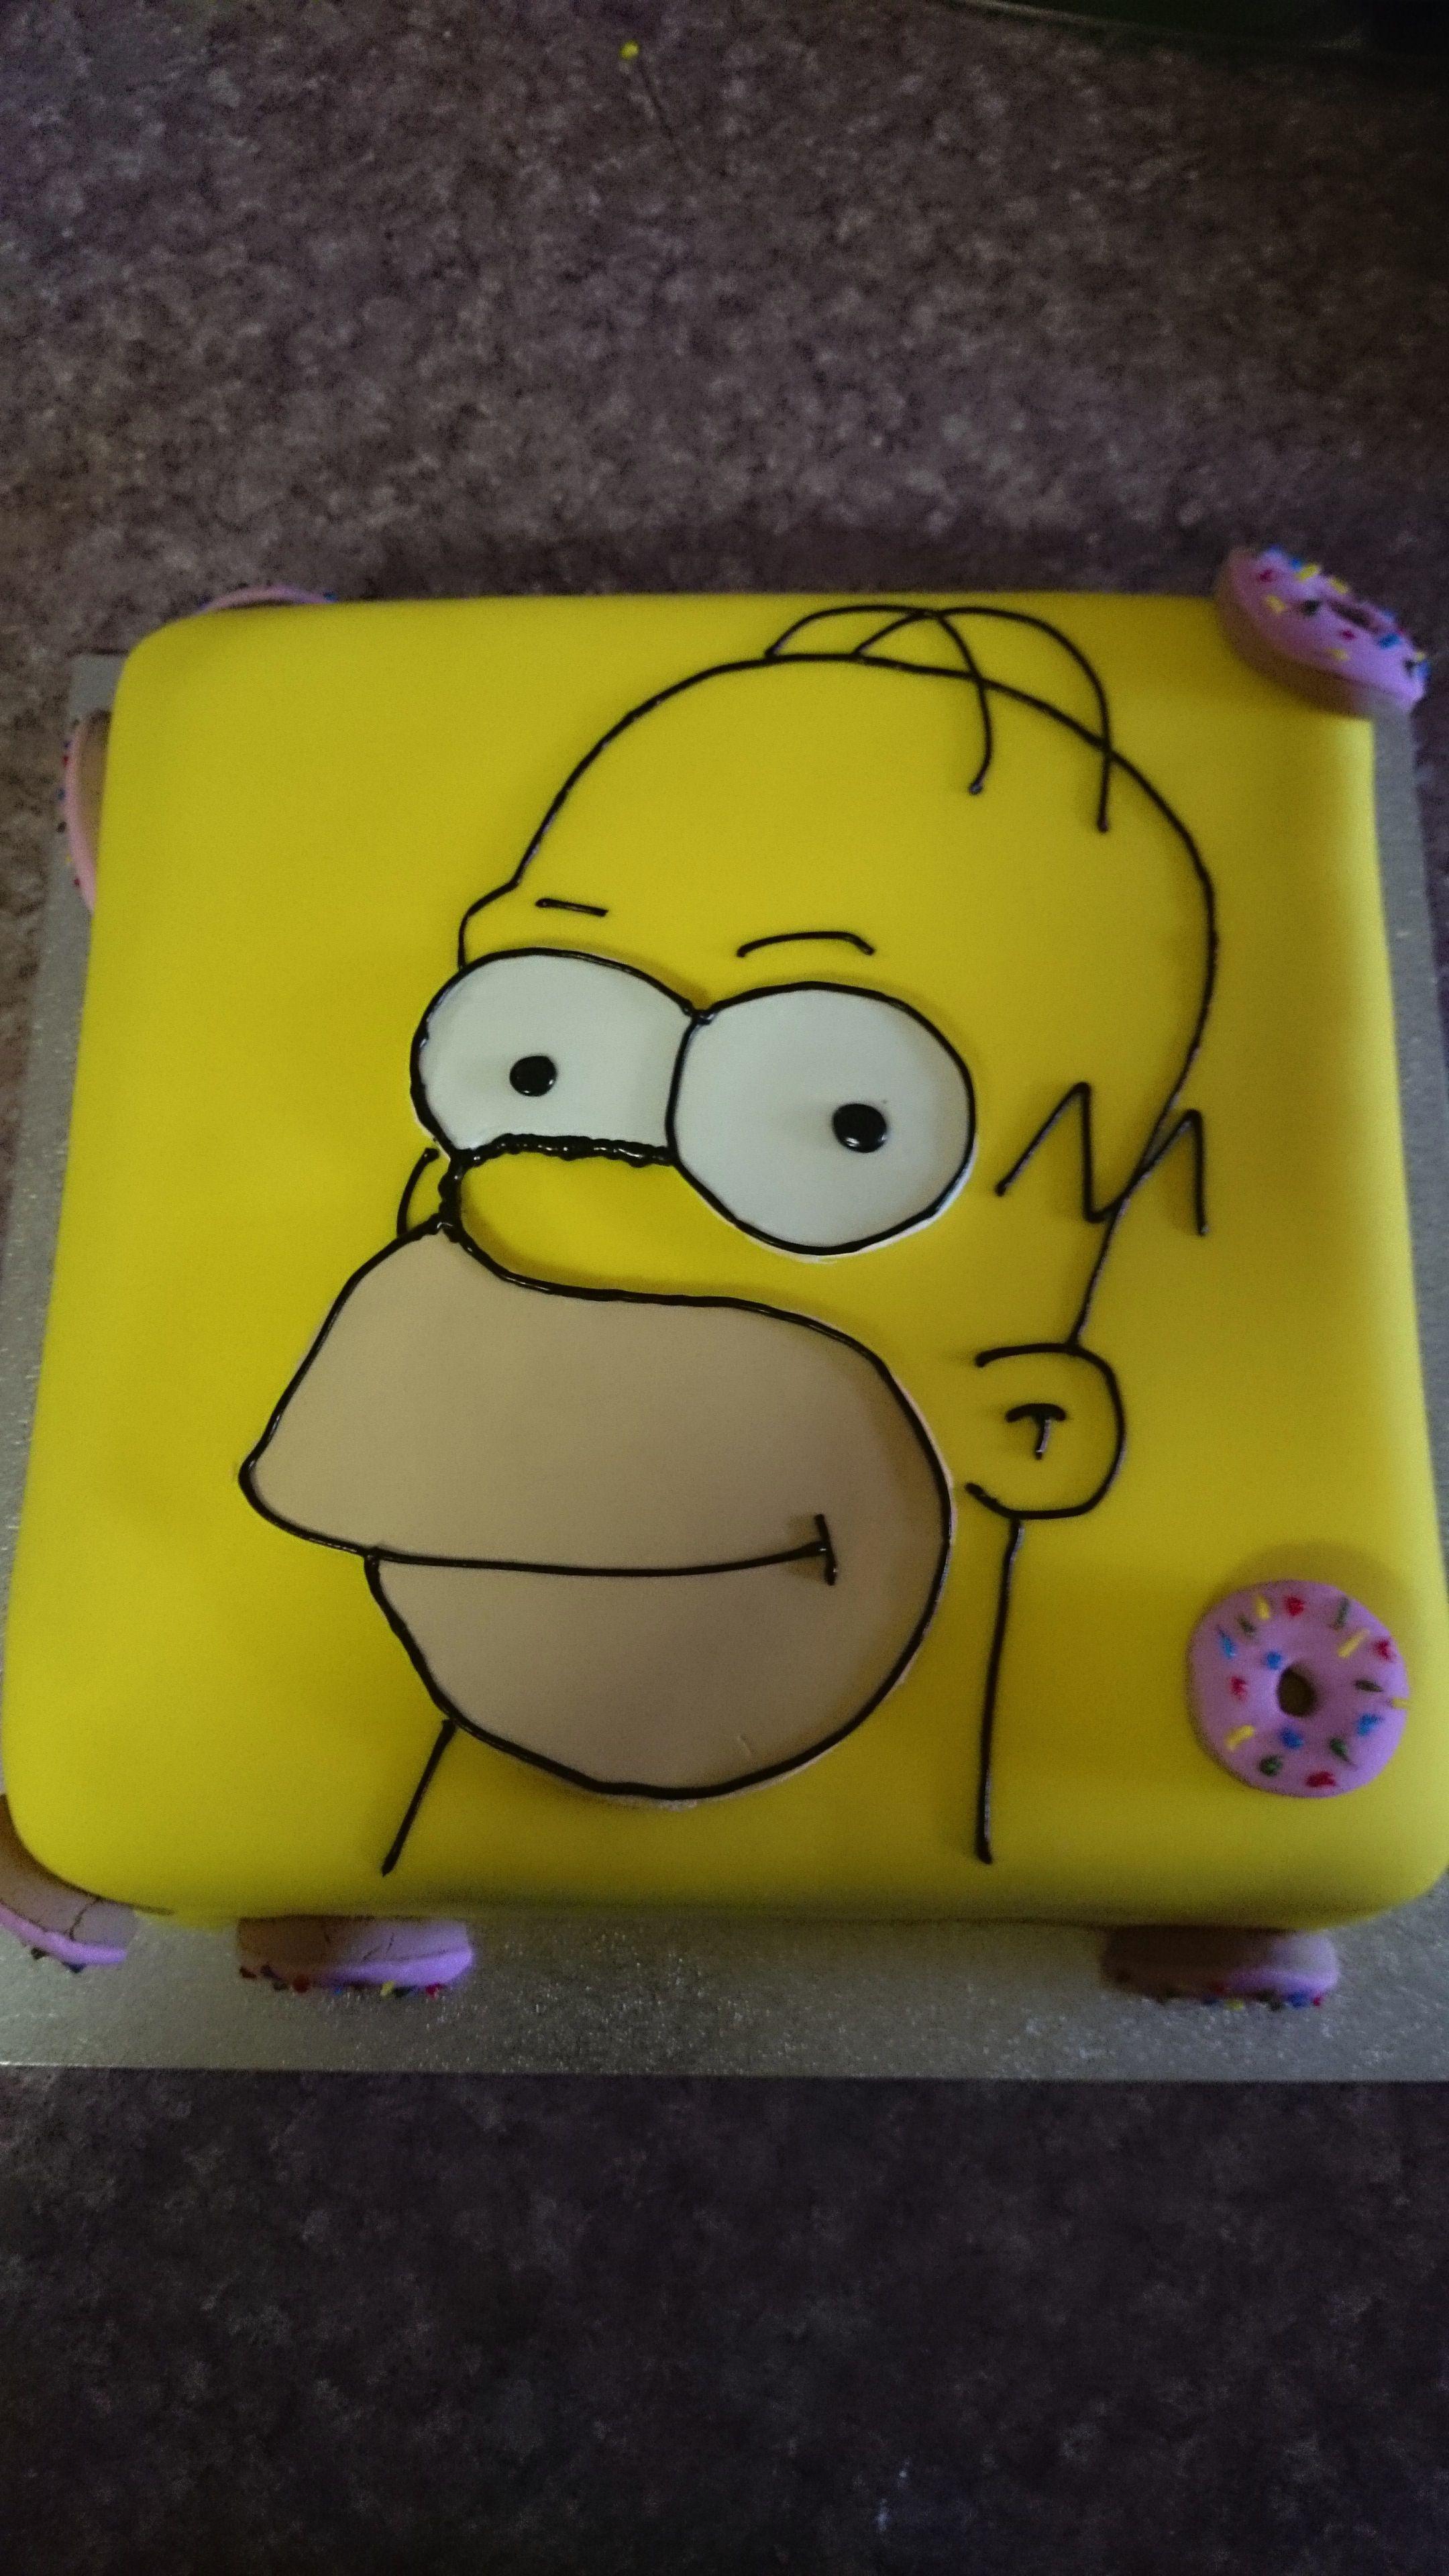 Admirable Homer Simpson Birthday Cake Simpsons Cake Homer Simpson Cake Funny Birthday Cards Online Sheoxdamsfinfo